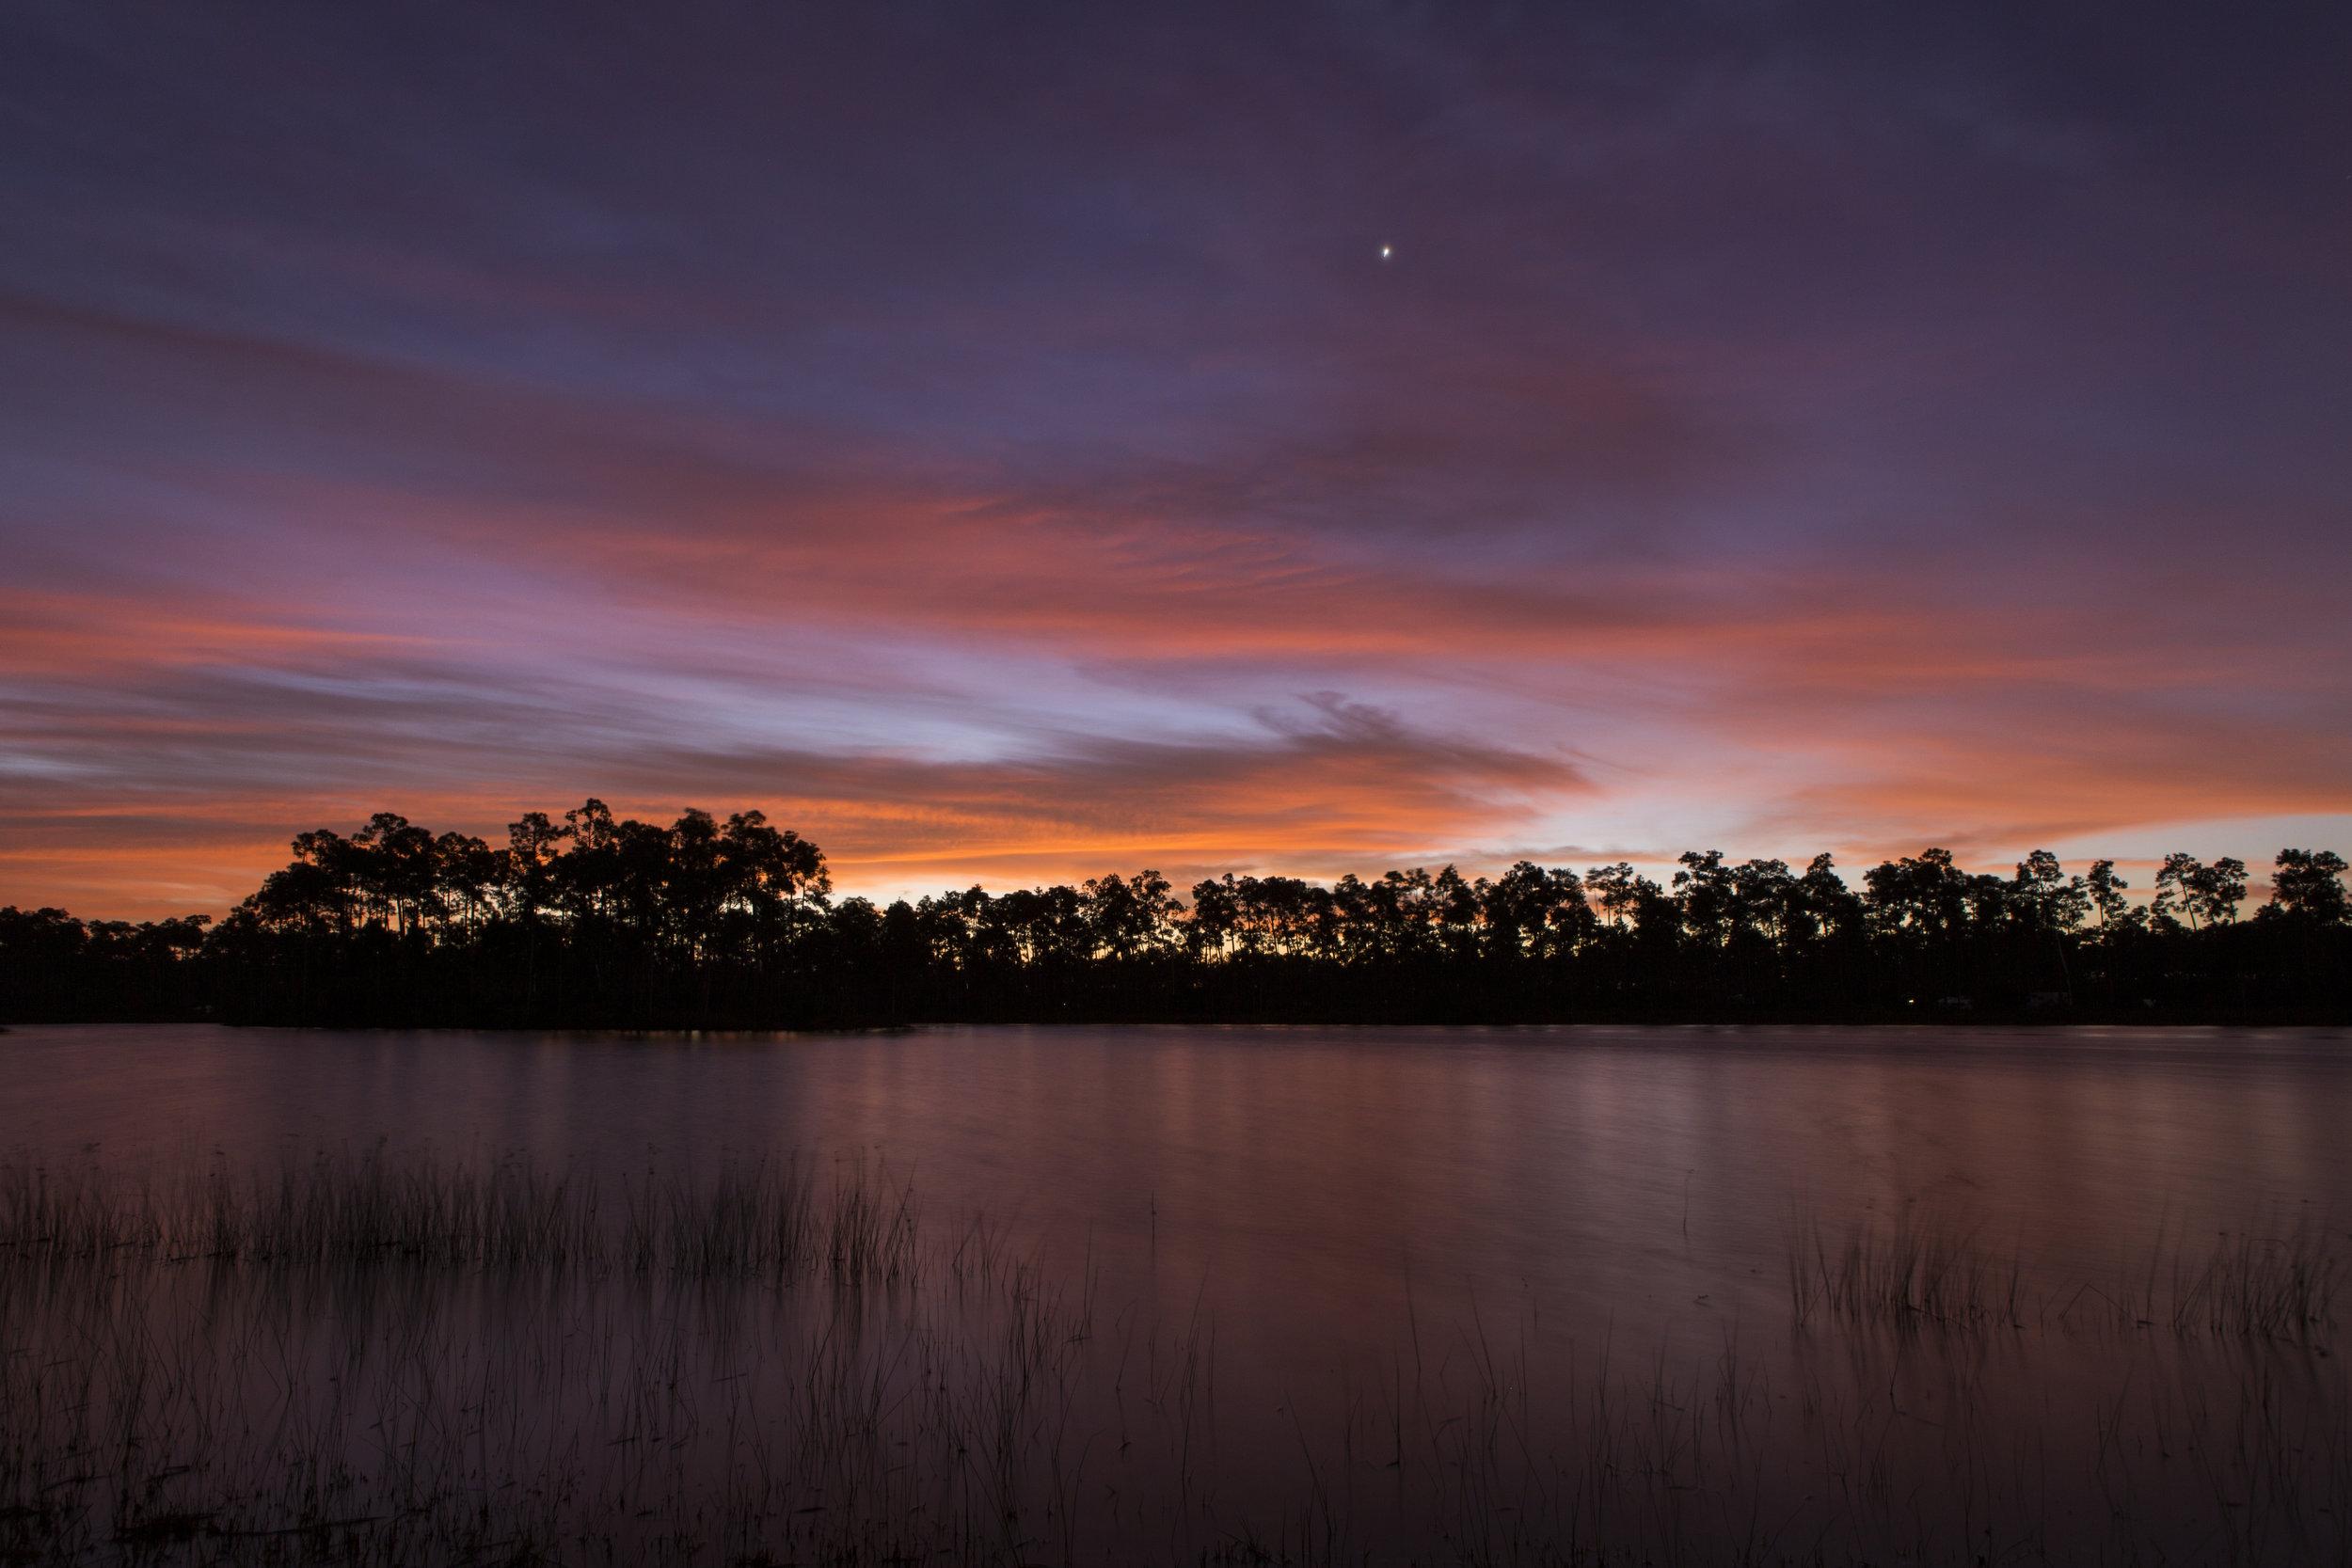 Sunrise over Everglades National Park